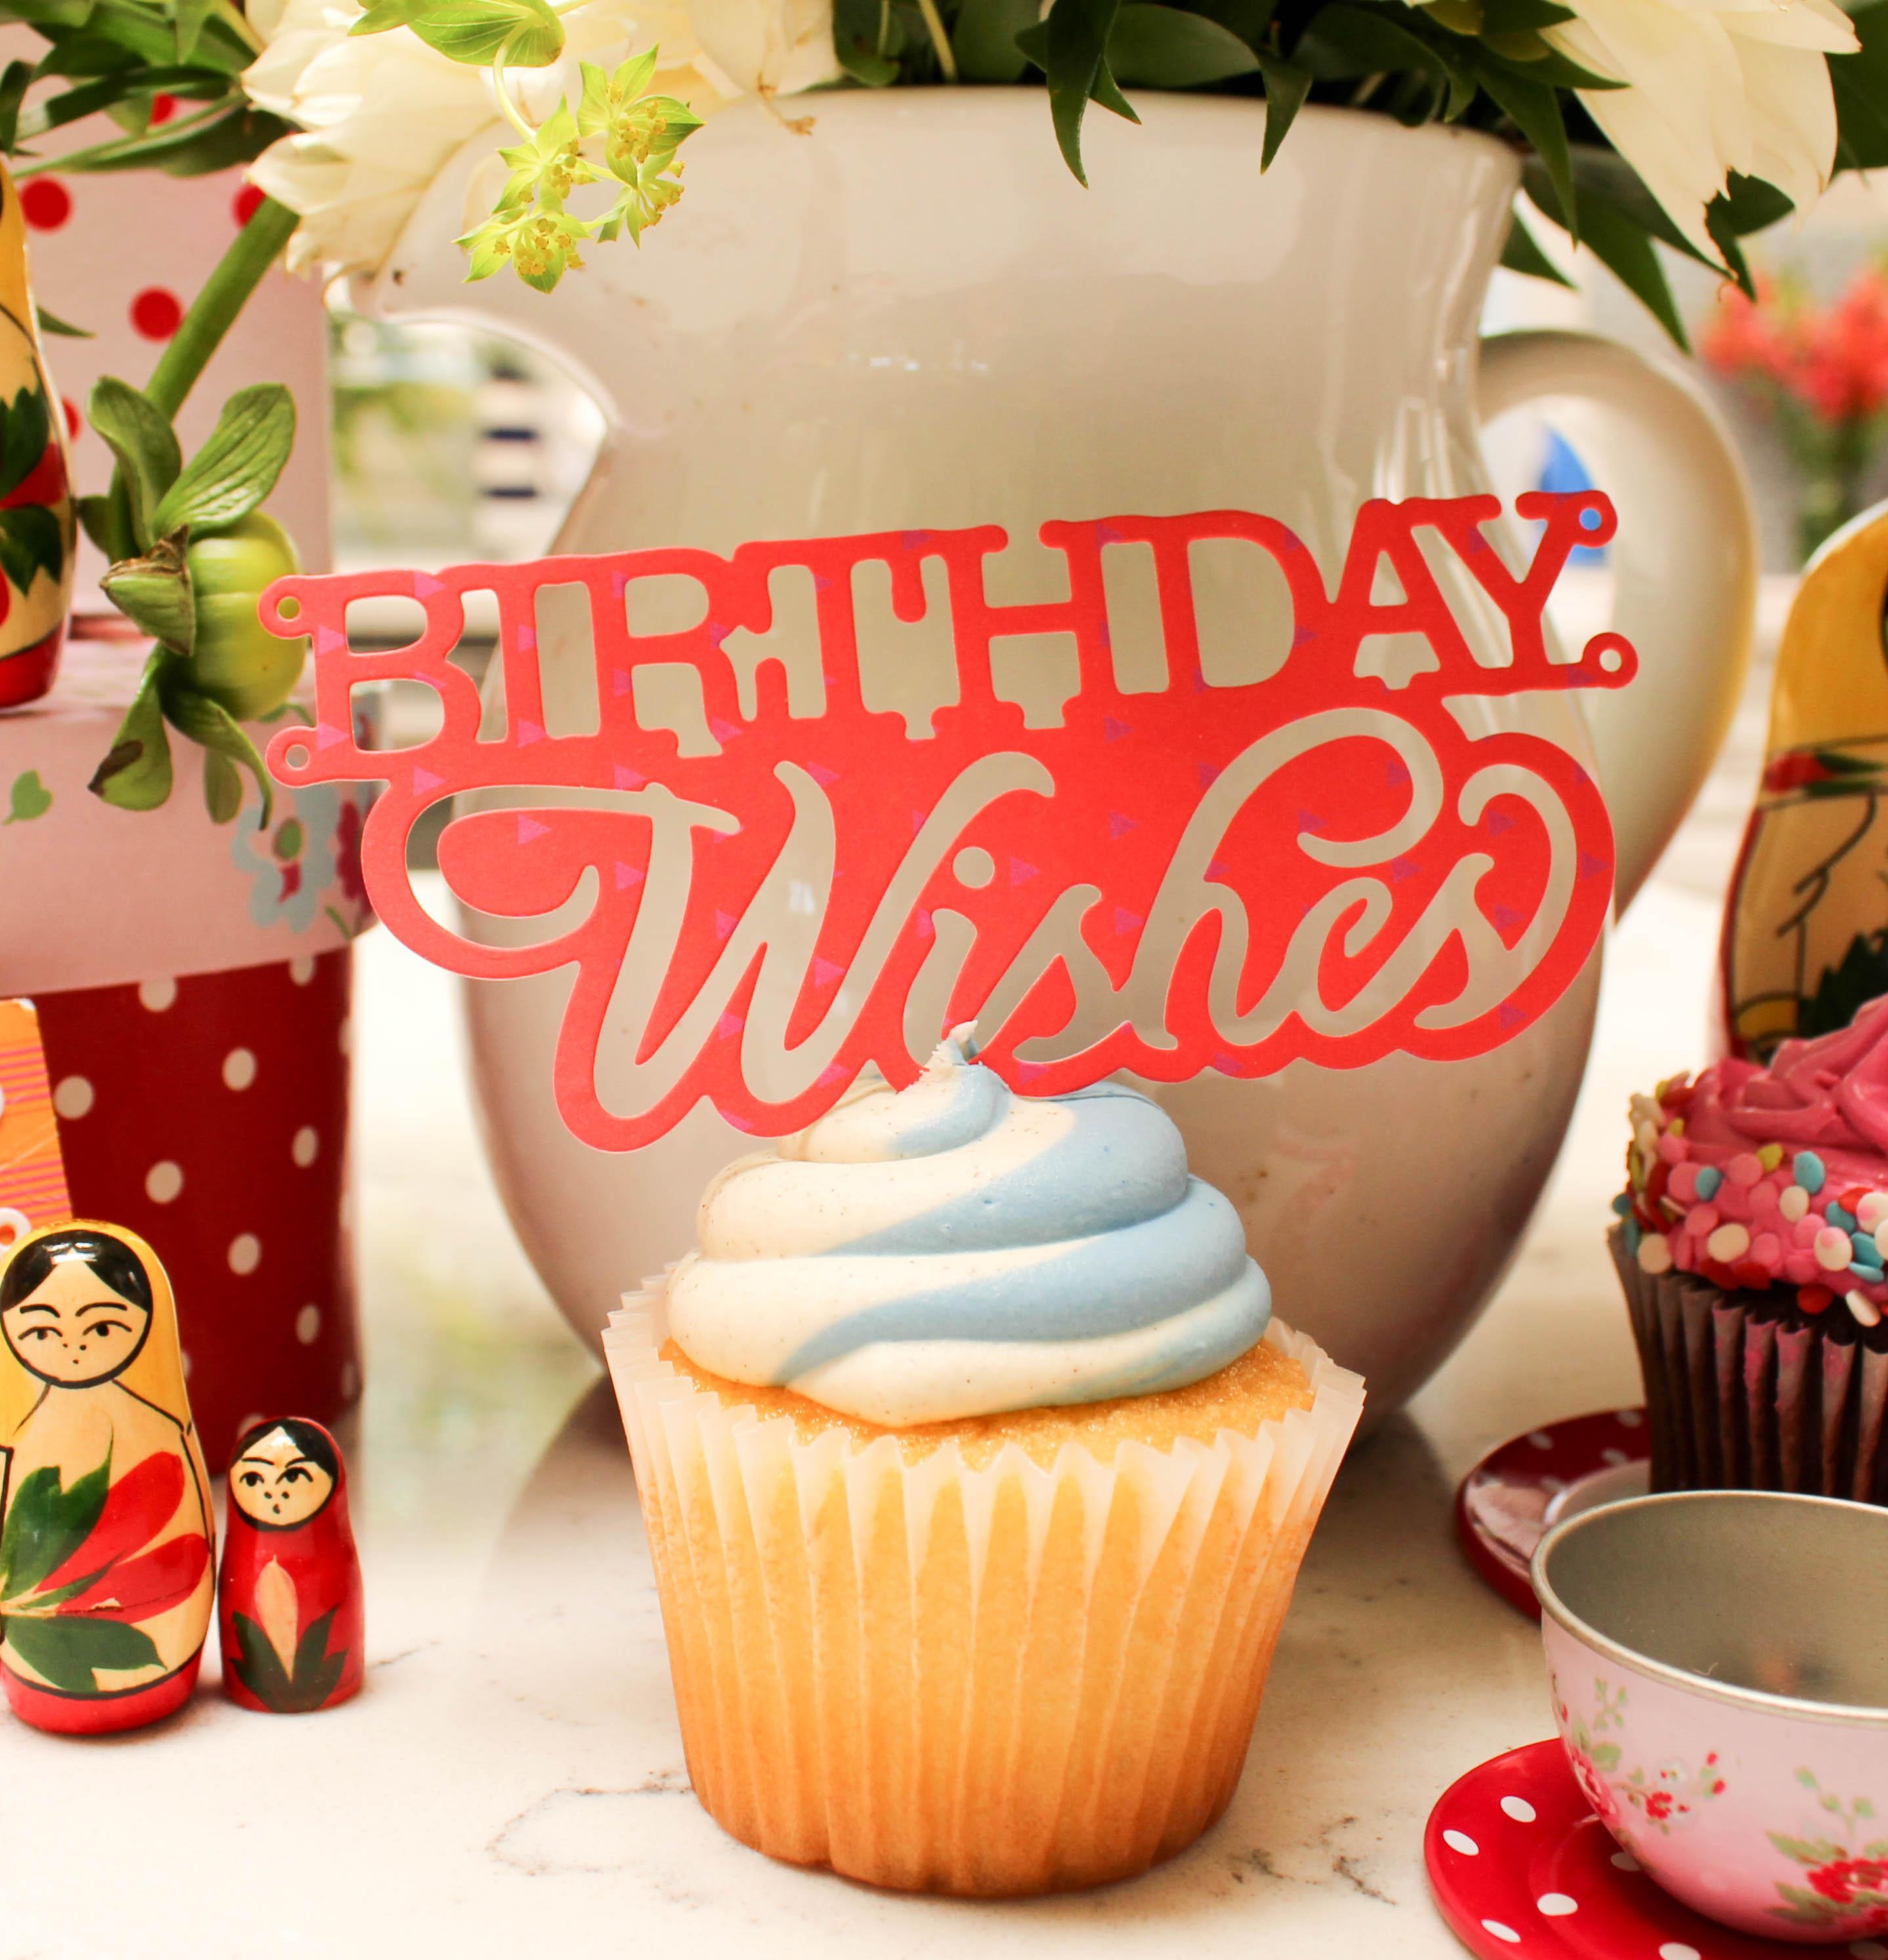 matroyshka nesting dolls where women cook sizzix dies birthday wishes cake topper-25